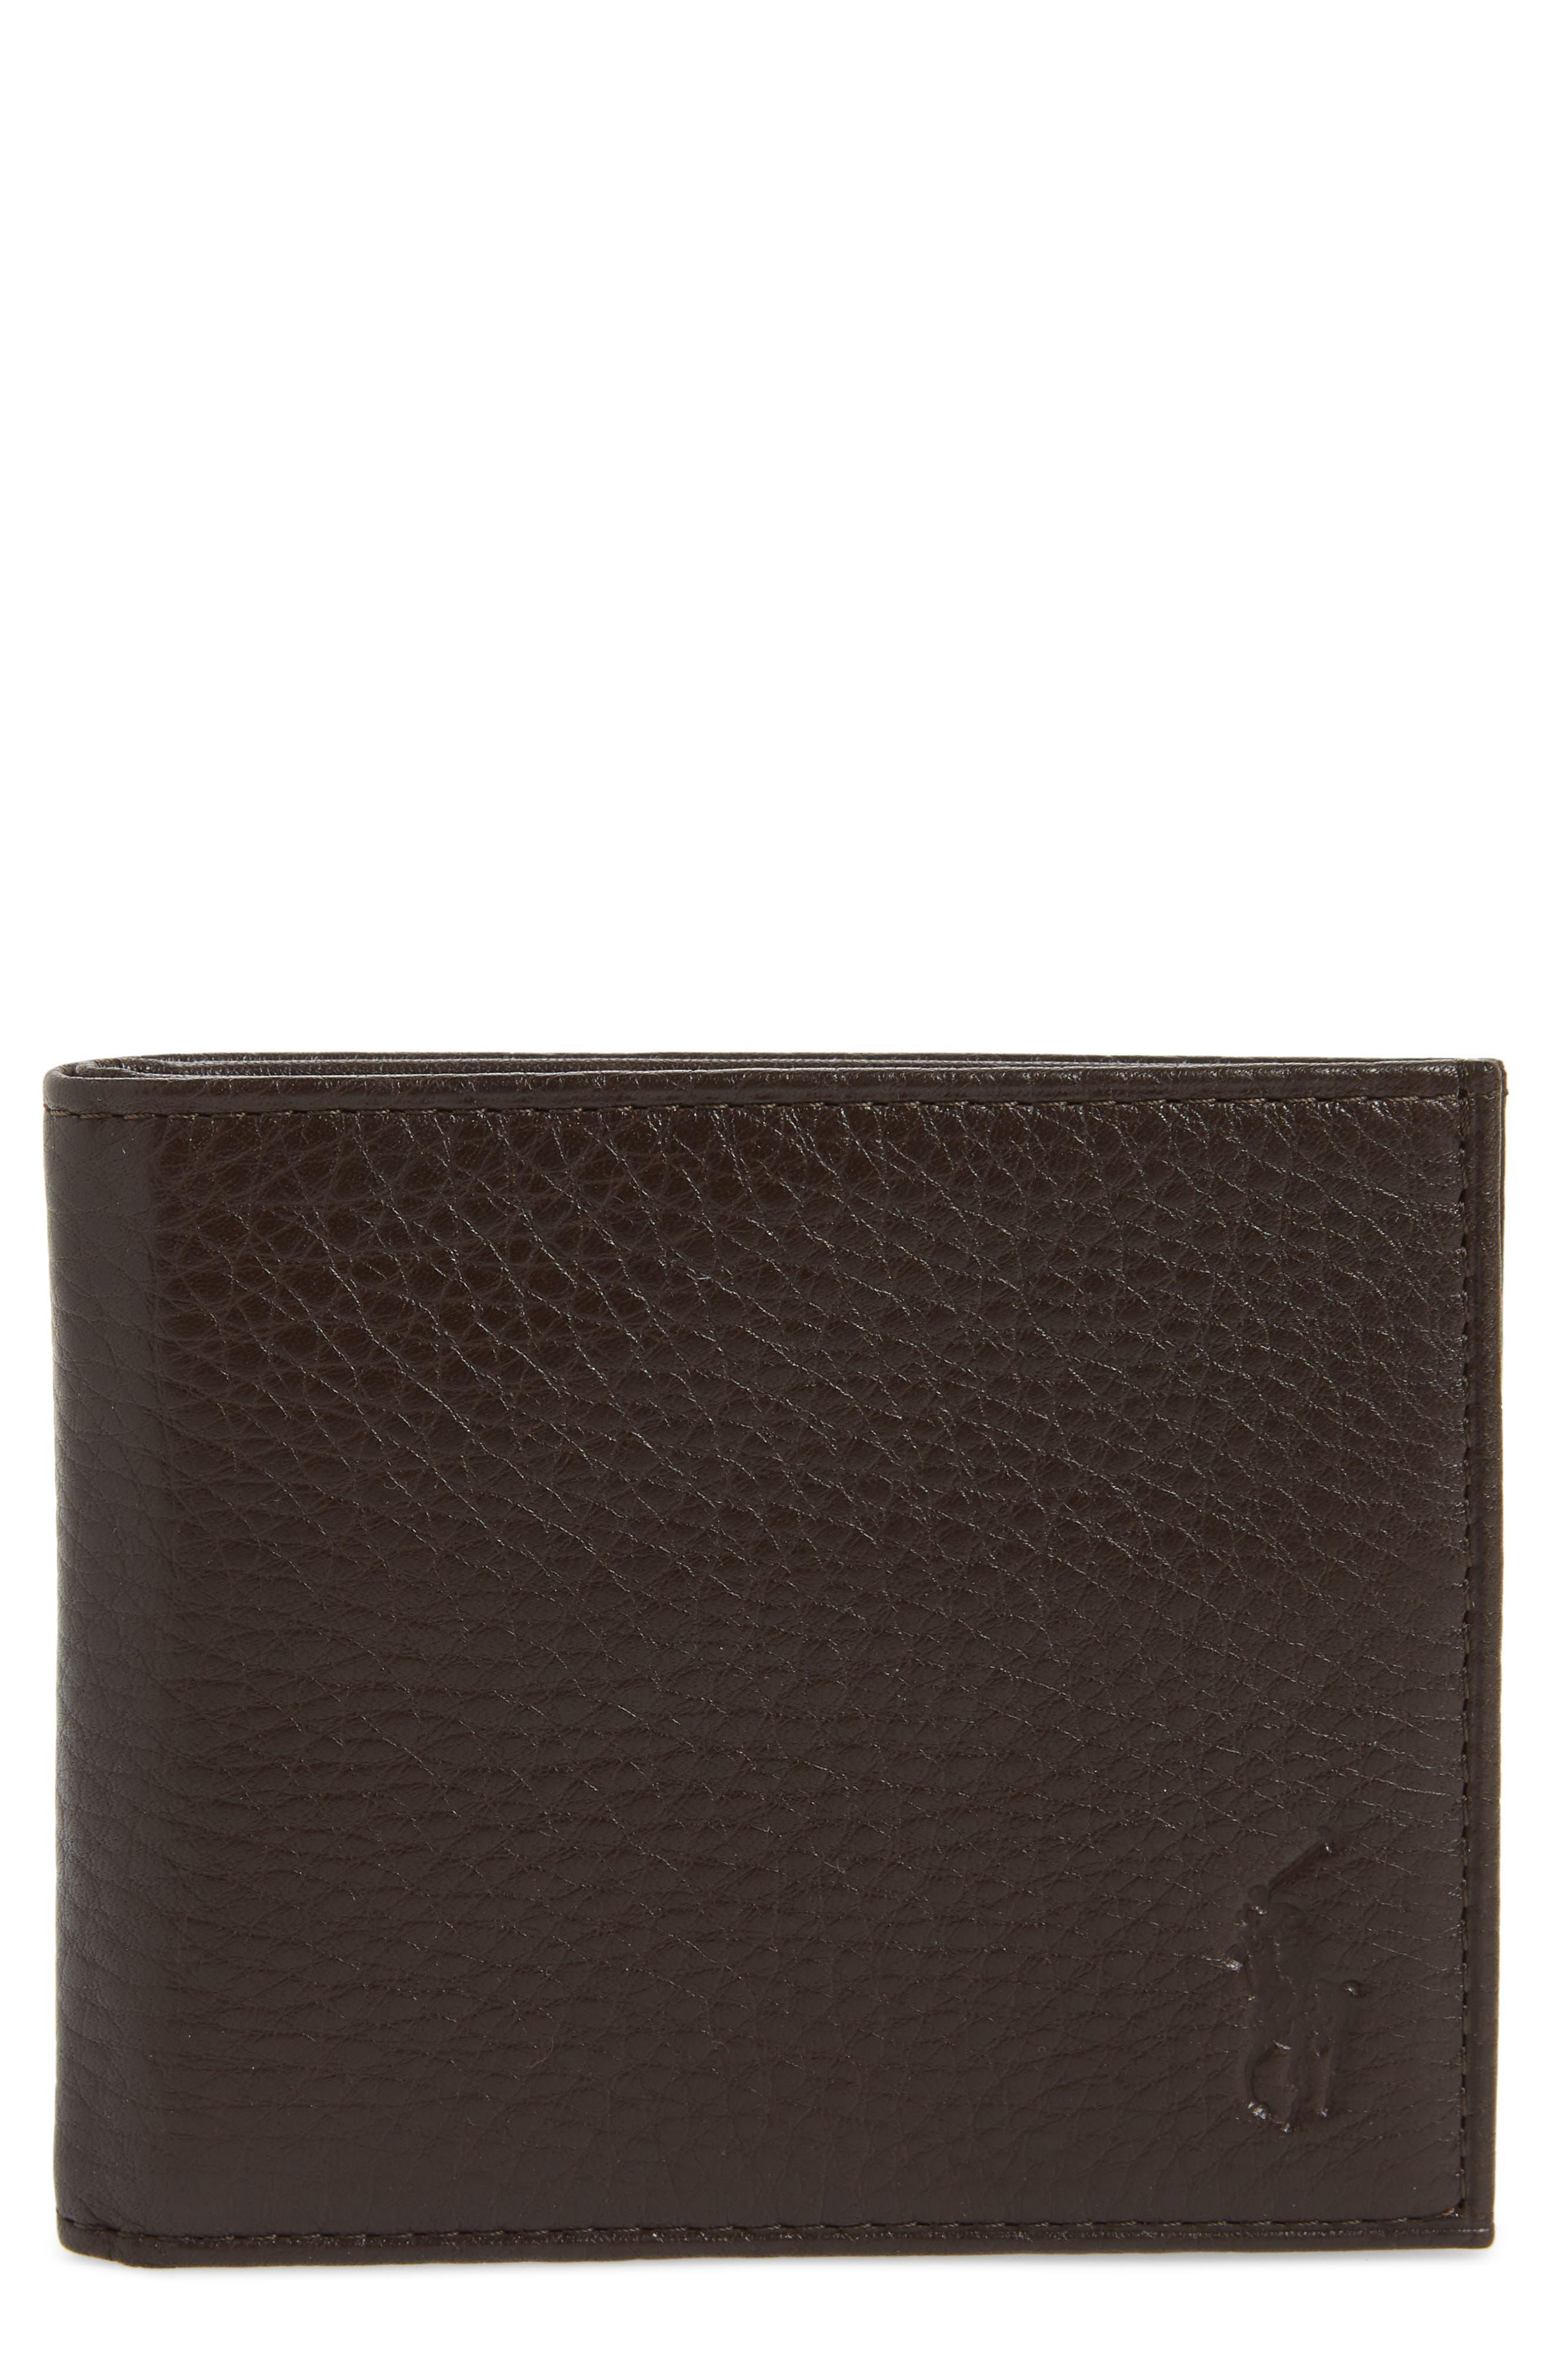 Main Image - Polo Ralph Lauren Bifold Leather Wallet